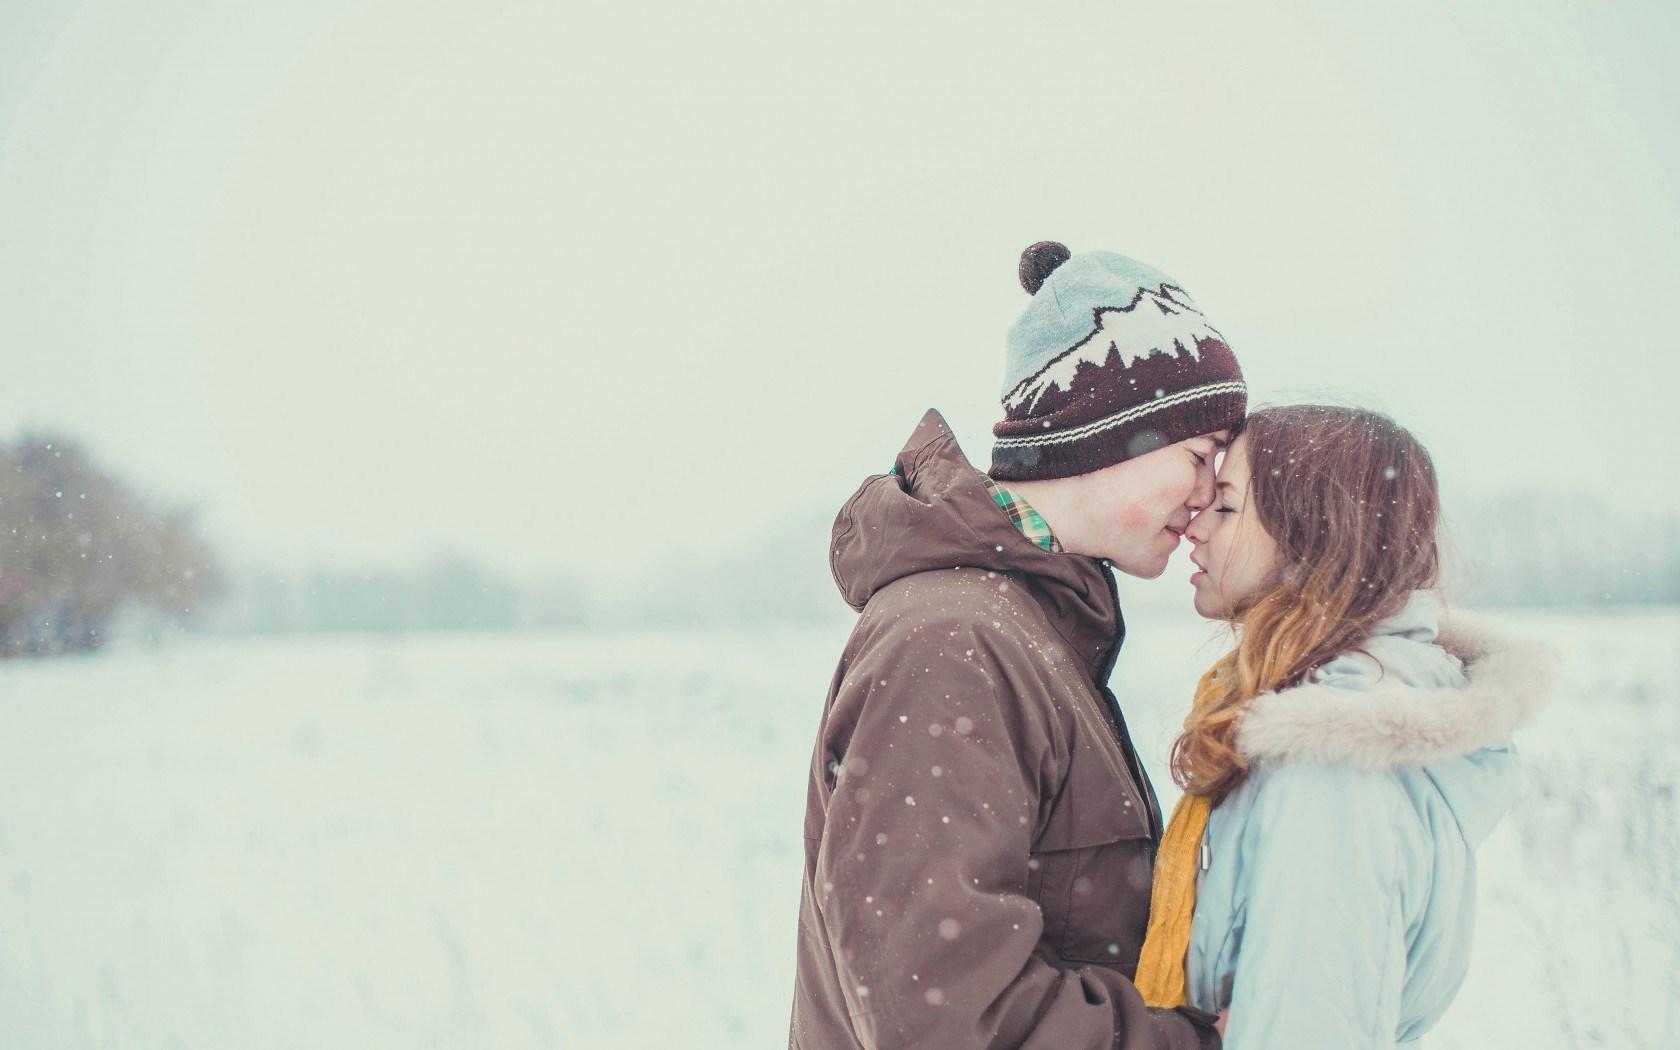 mood-girl-boy-winter-snow-tenderness-love-hd-wallpaper